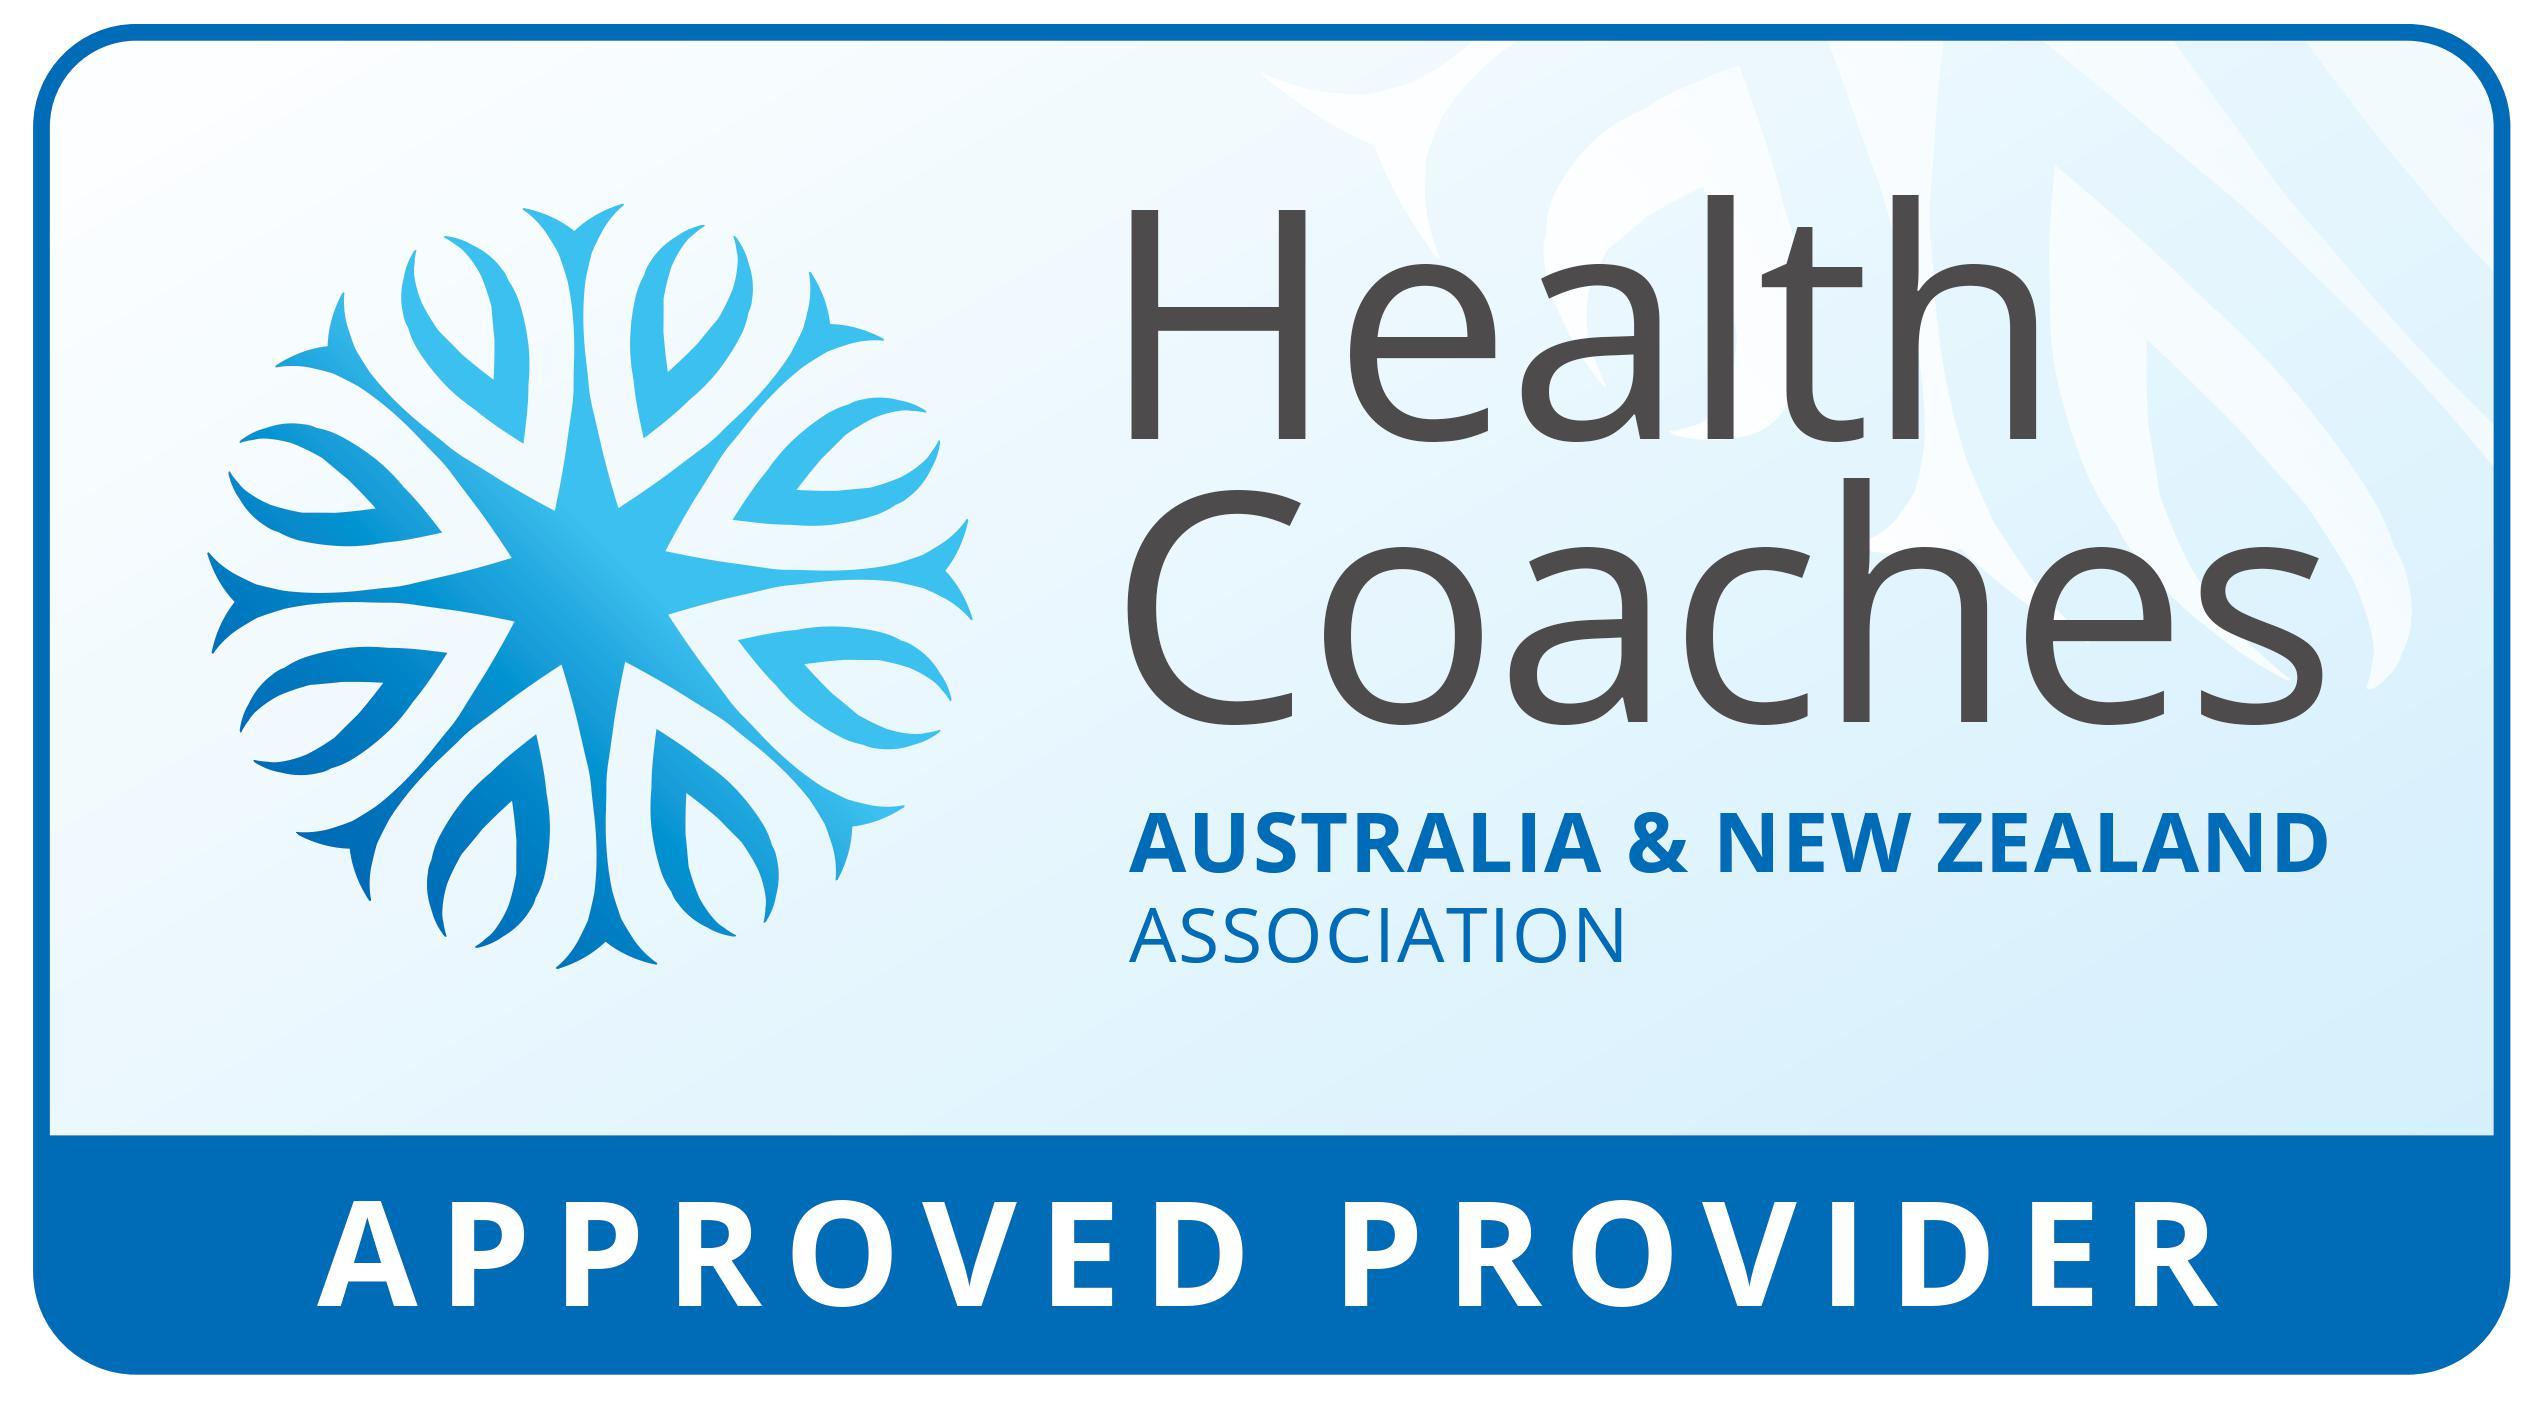 Health Coaches Australia and New Zealand Association